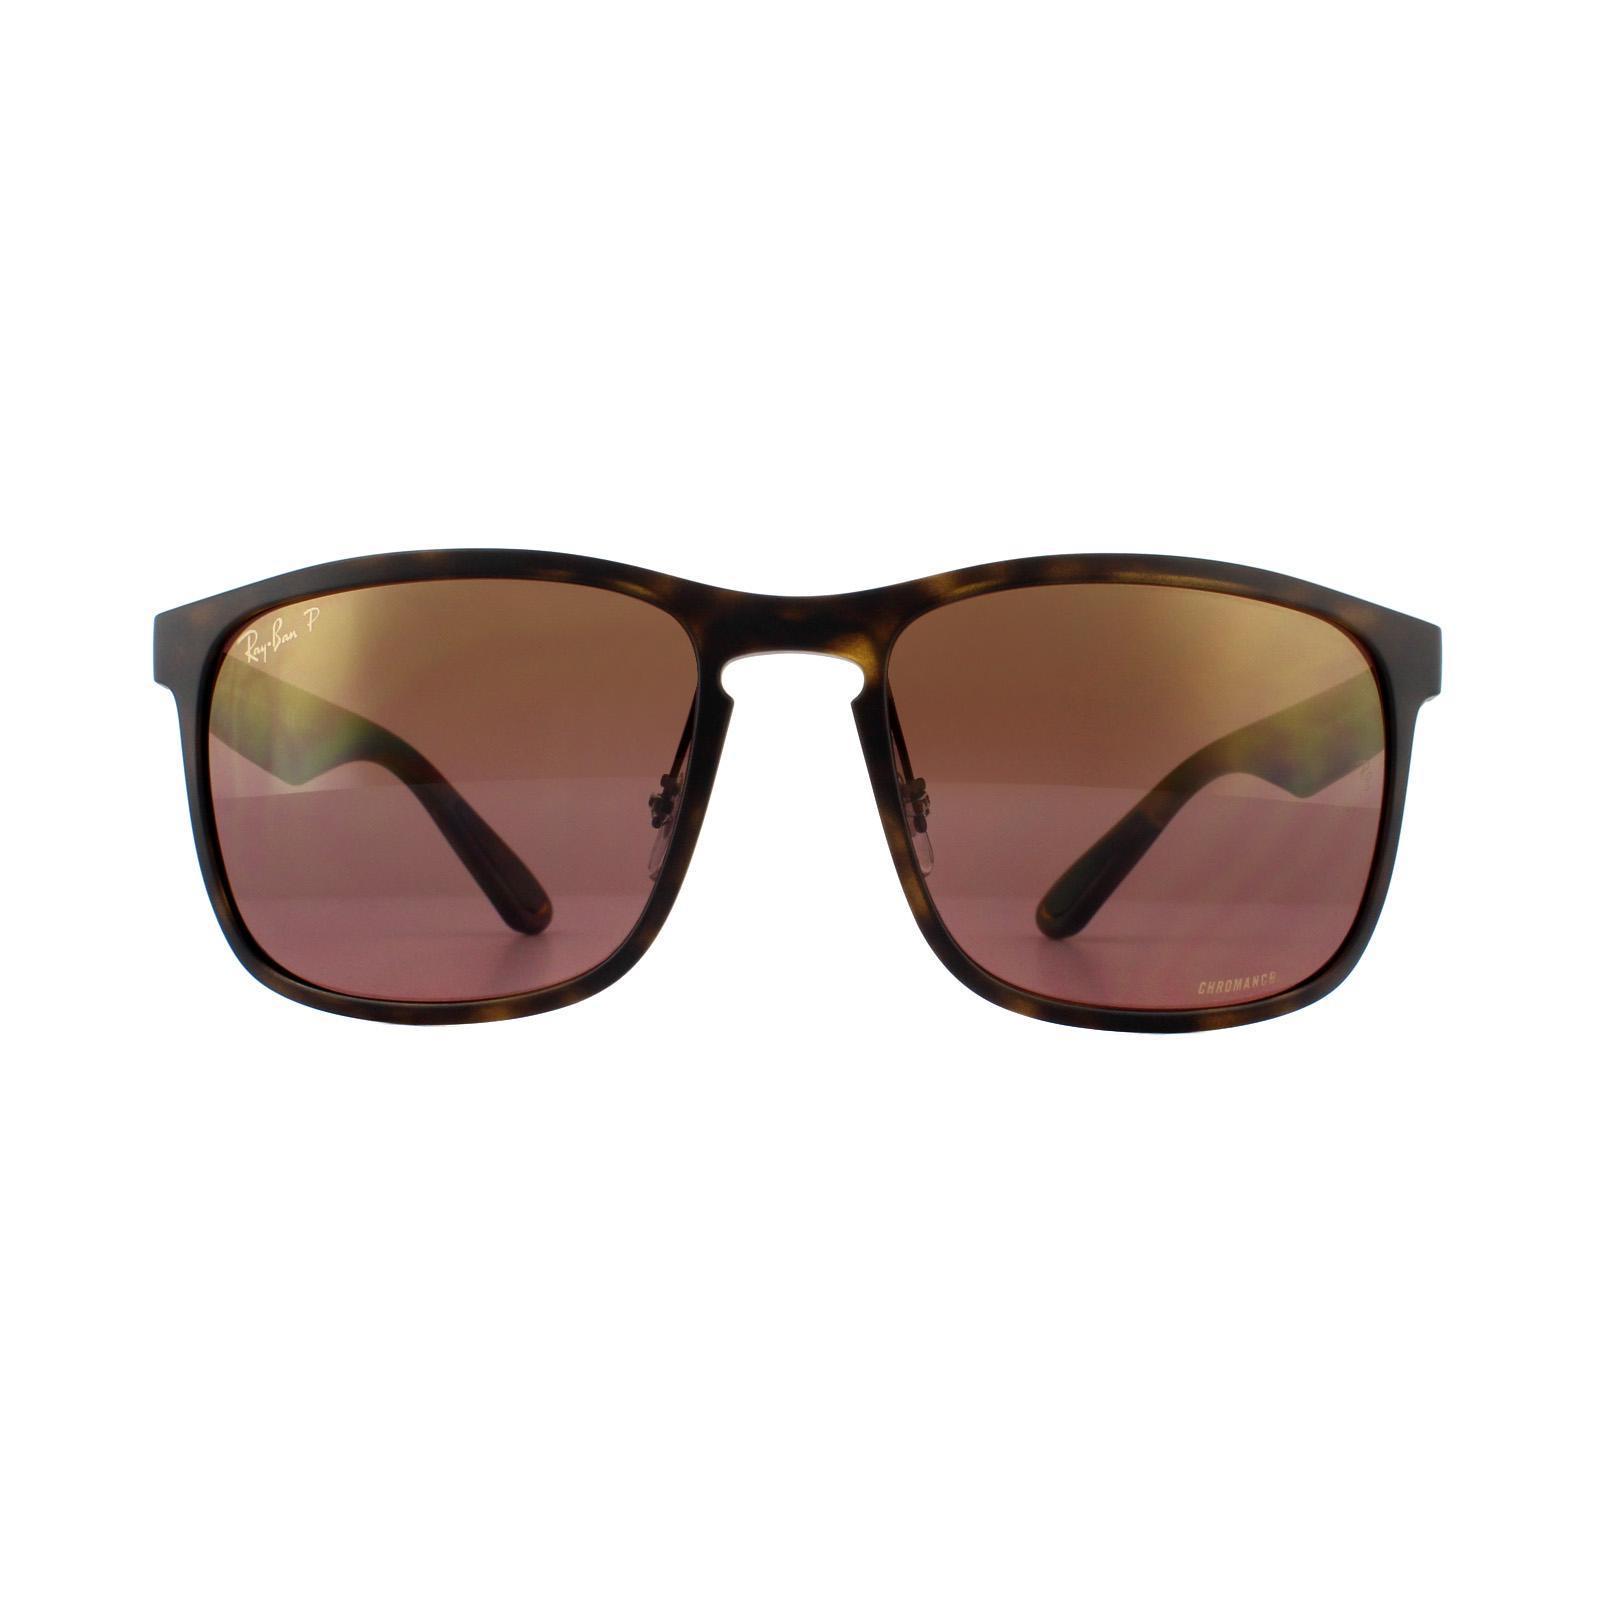 17effe209b Sentinel Ray-Ban Sunglasses RB4264 894 6B Matte Havana Brown Polarized  Mirror Chromance